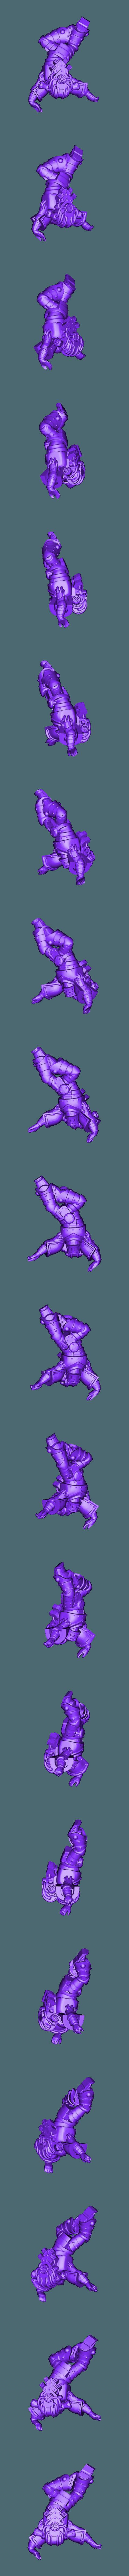 SpeederAM1.stl Download free STL file Angry Air - Frugal Displeased Soldier Deployment Vessel • 3D printing model, FelixTheCrazy